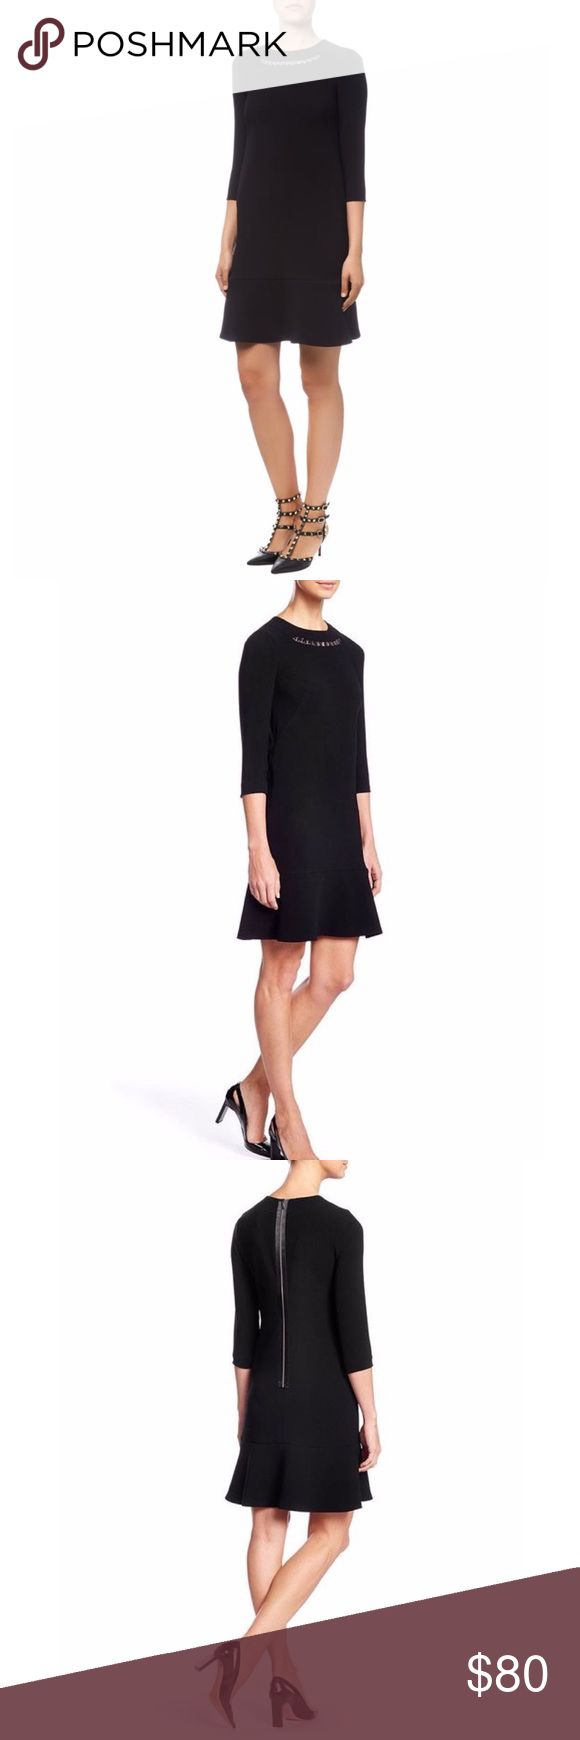 Escada Dejanina Black Dress Escada Dejanina Black Dress.  Hardware Necklace attached. MIDI Dress with bottom tulip silhouette.  NWOT.  Size 38 euro. Escada Dresses Midi